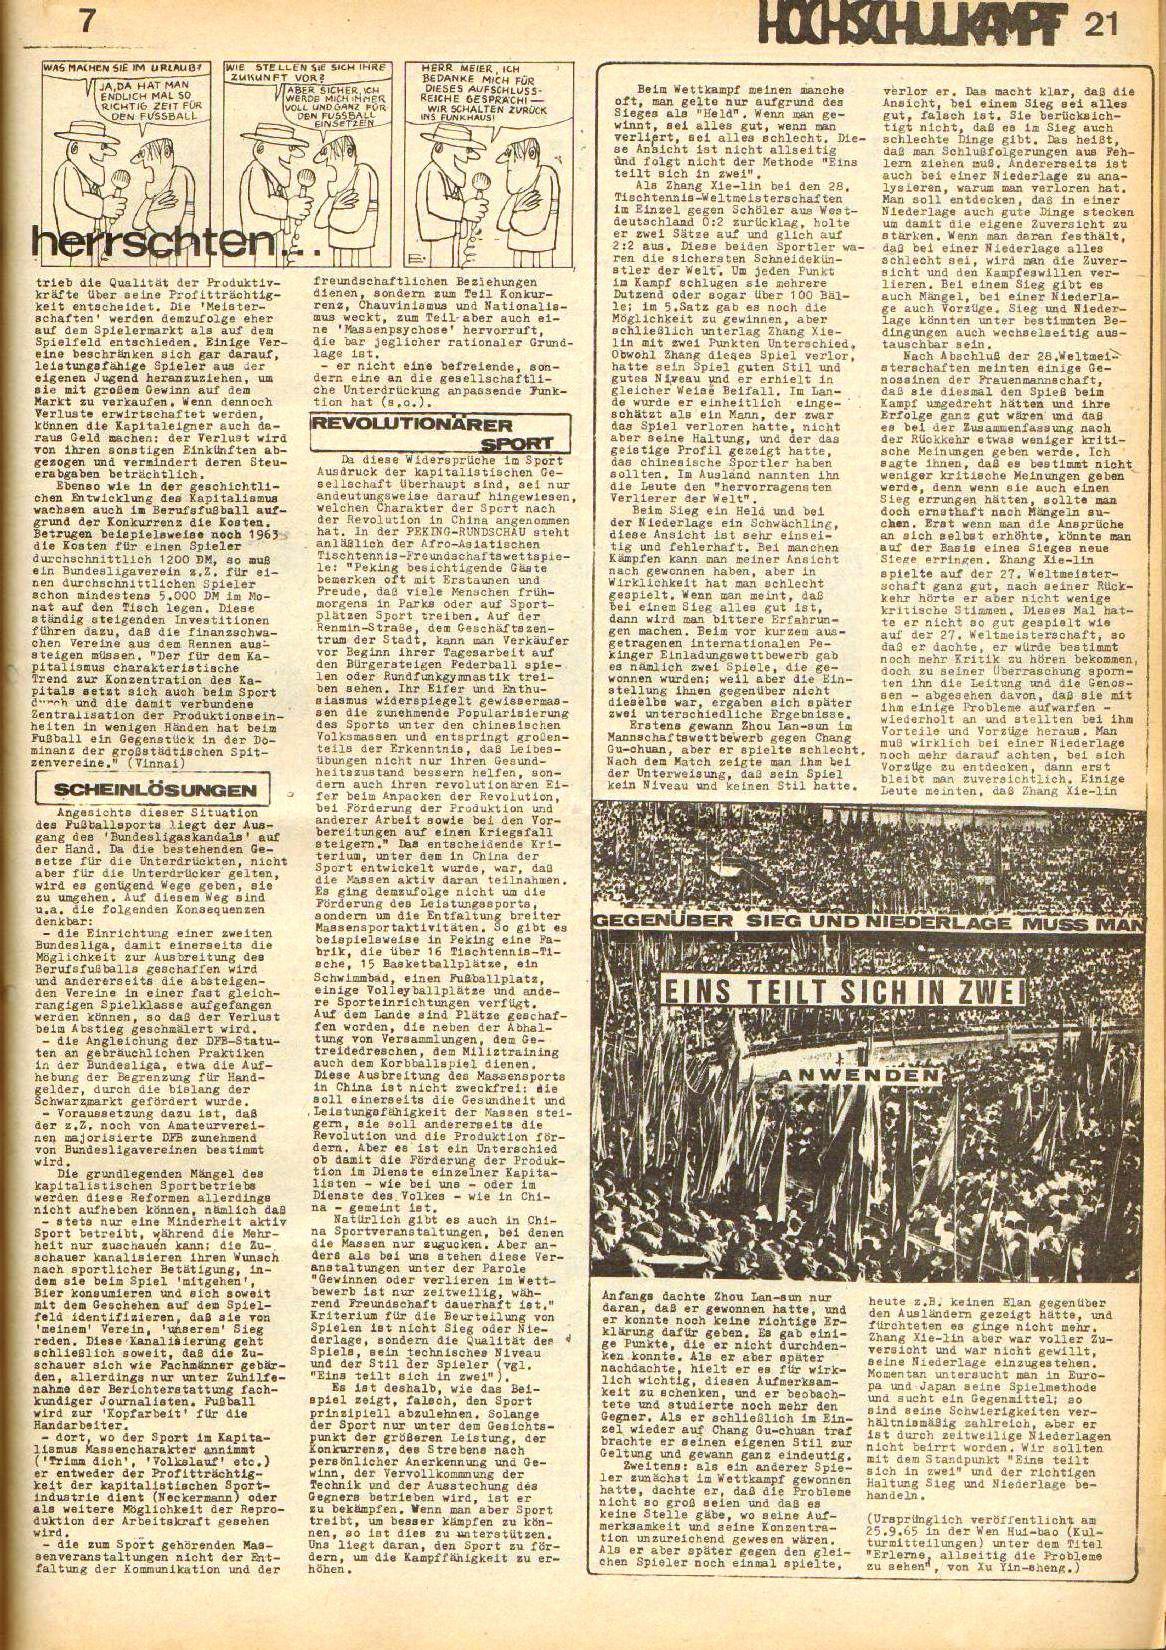 Berlin_Hochschulkampf_1971_21_09